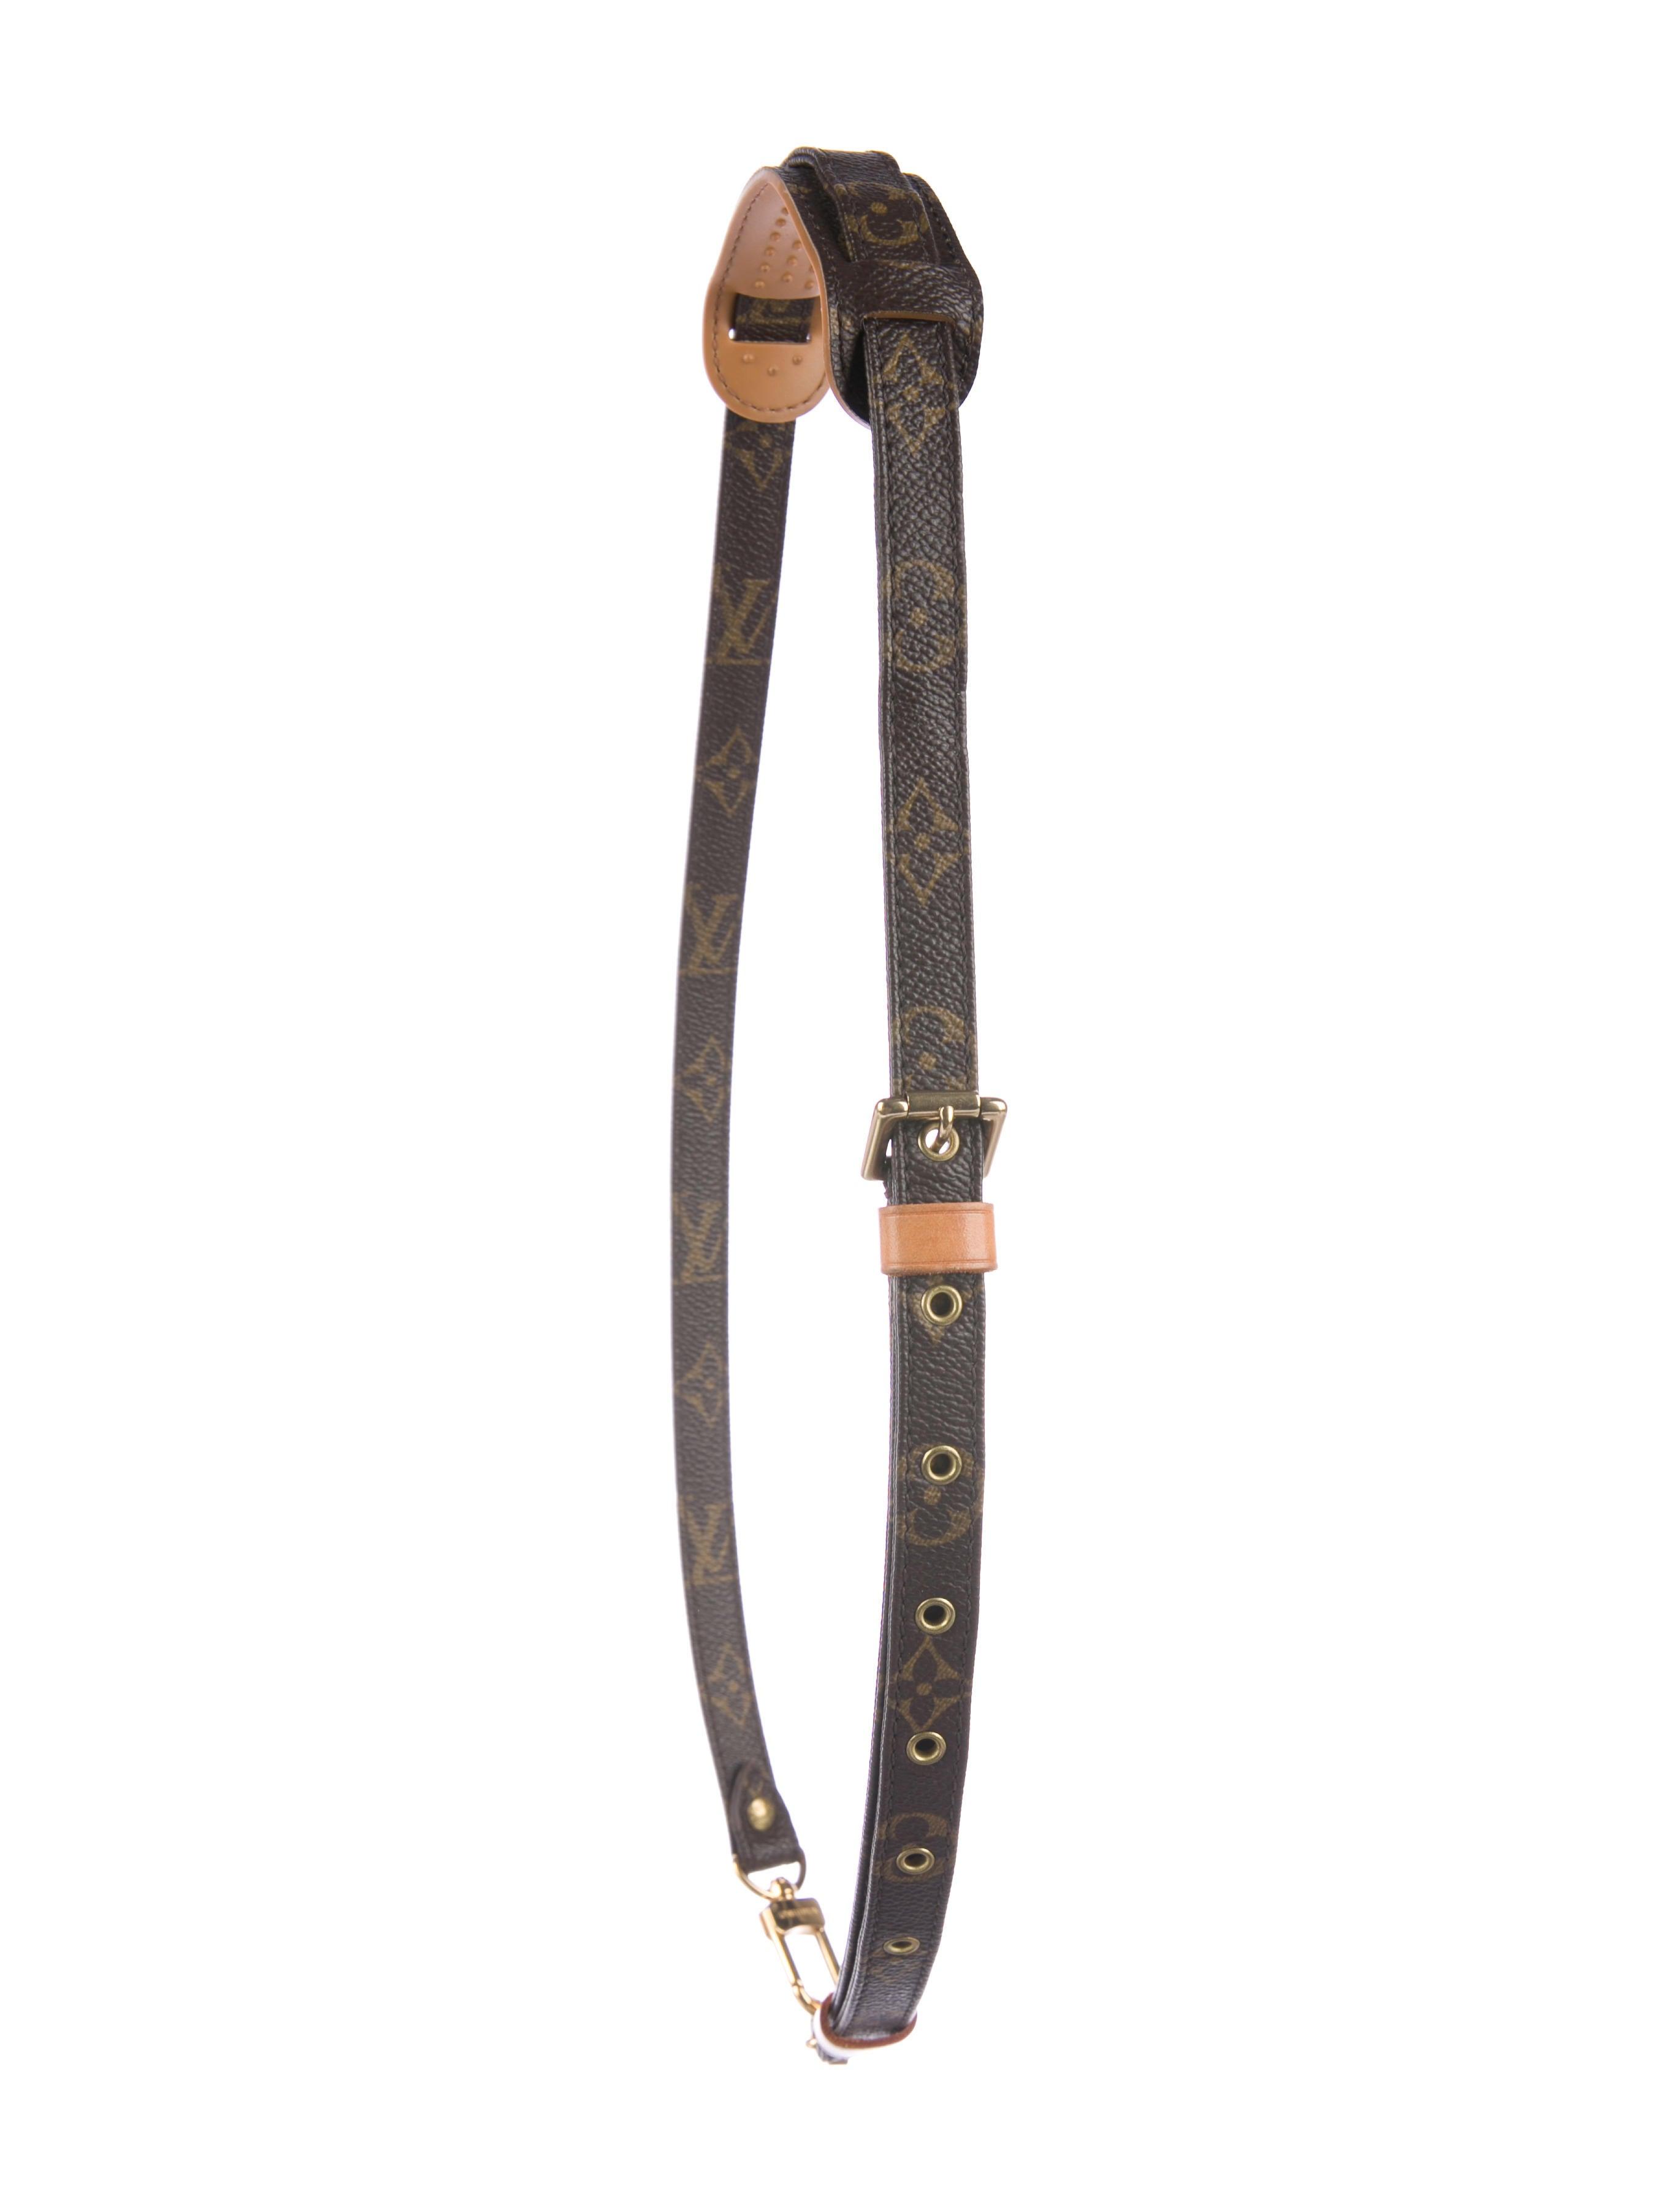 Louis Vuitton Monogram Adjustable Shoulder Strap 16mm Accessories Lou161373 The Realreal